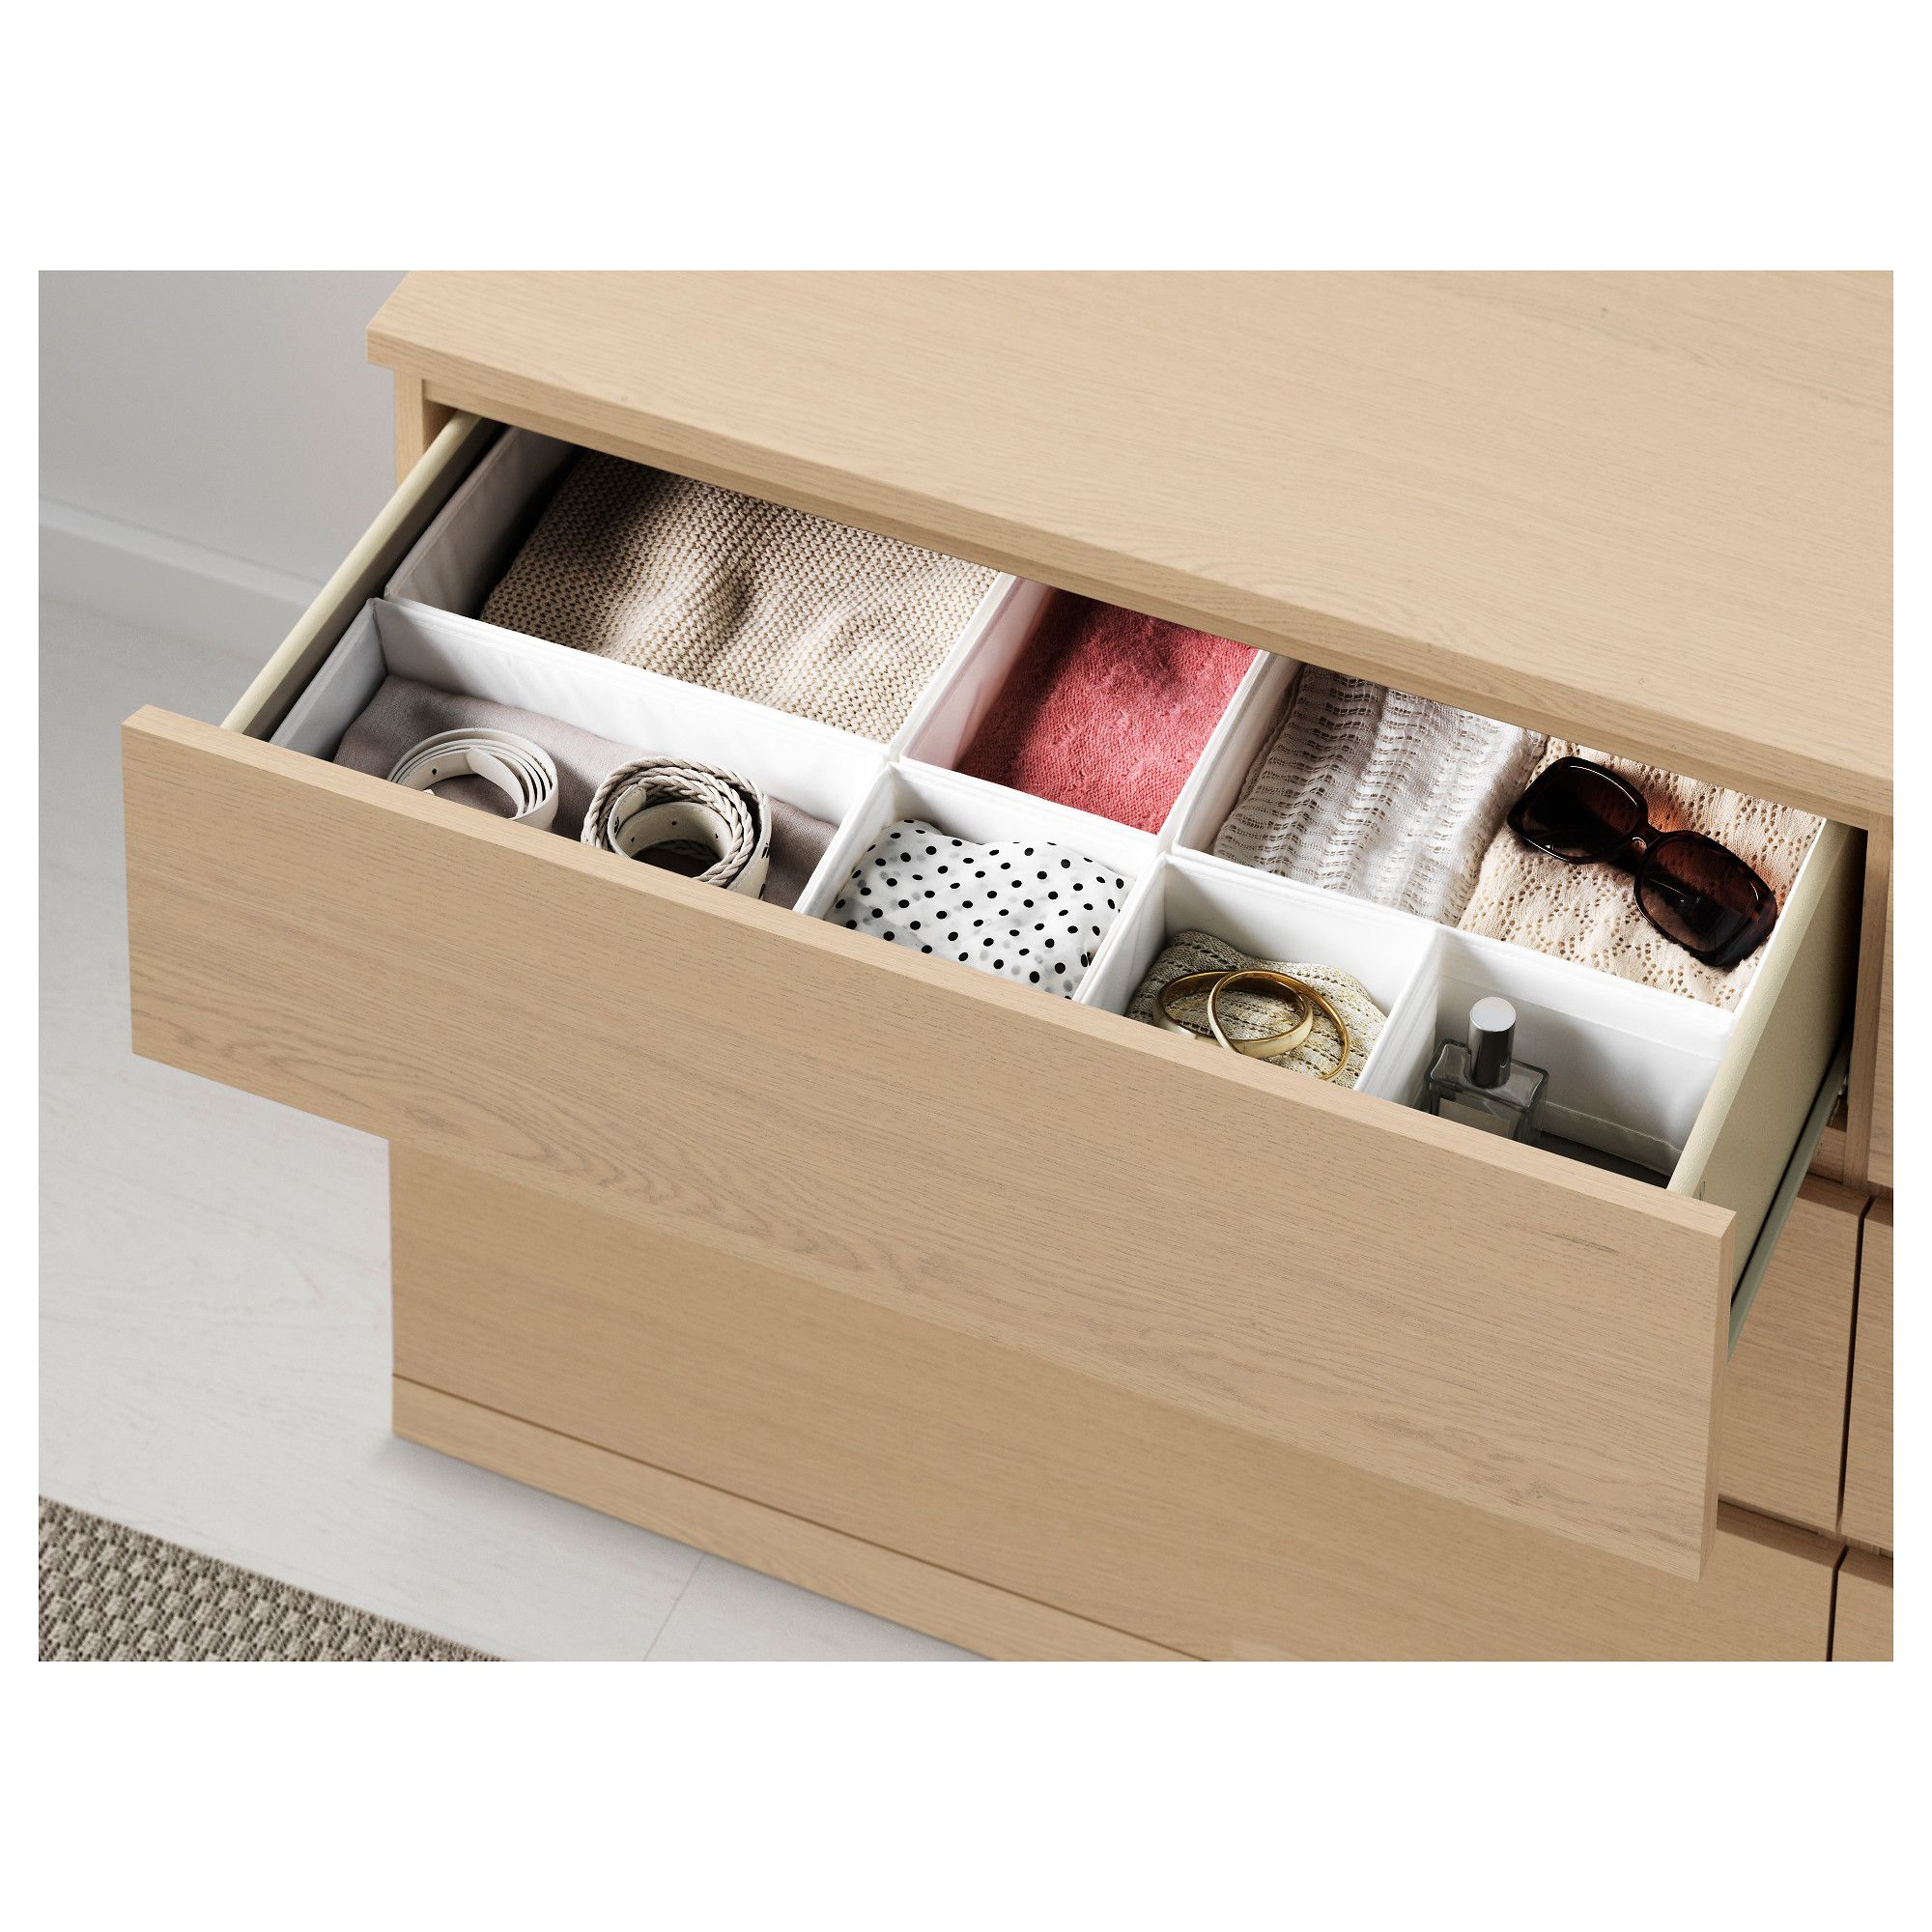 Ikea Malm 6 Drawer Dresser White Stained Oak Veneer In 2019